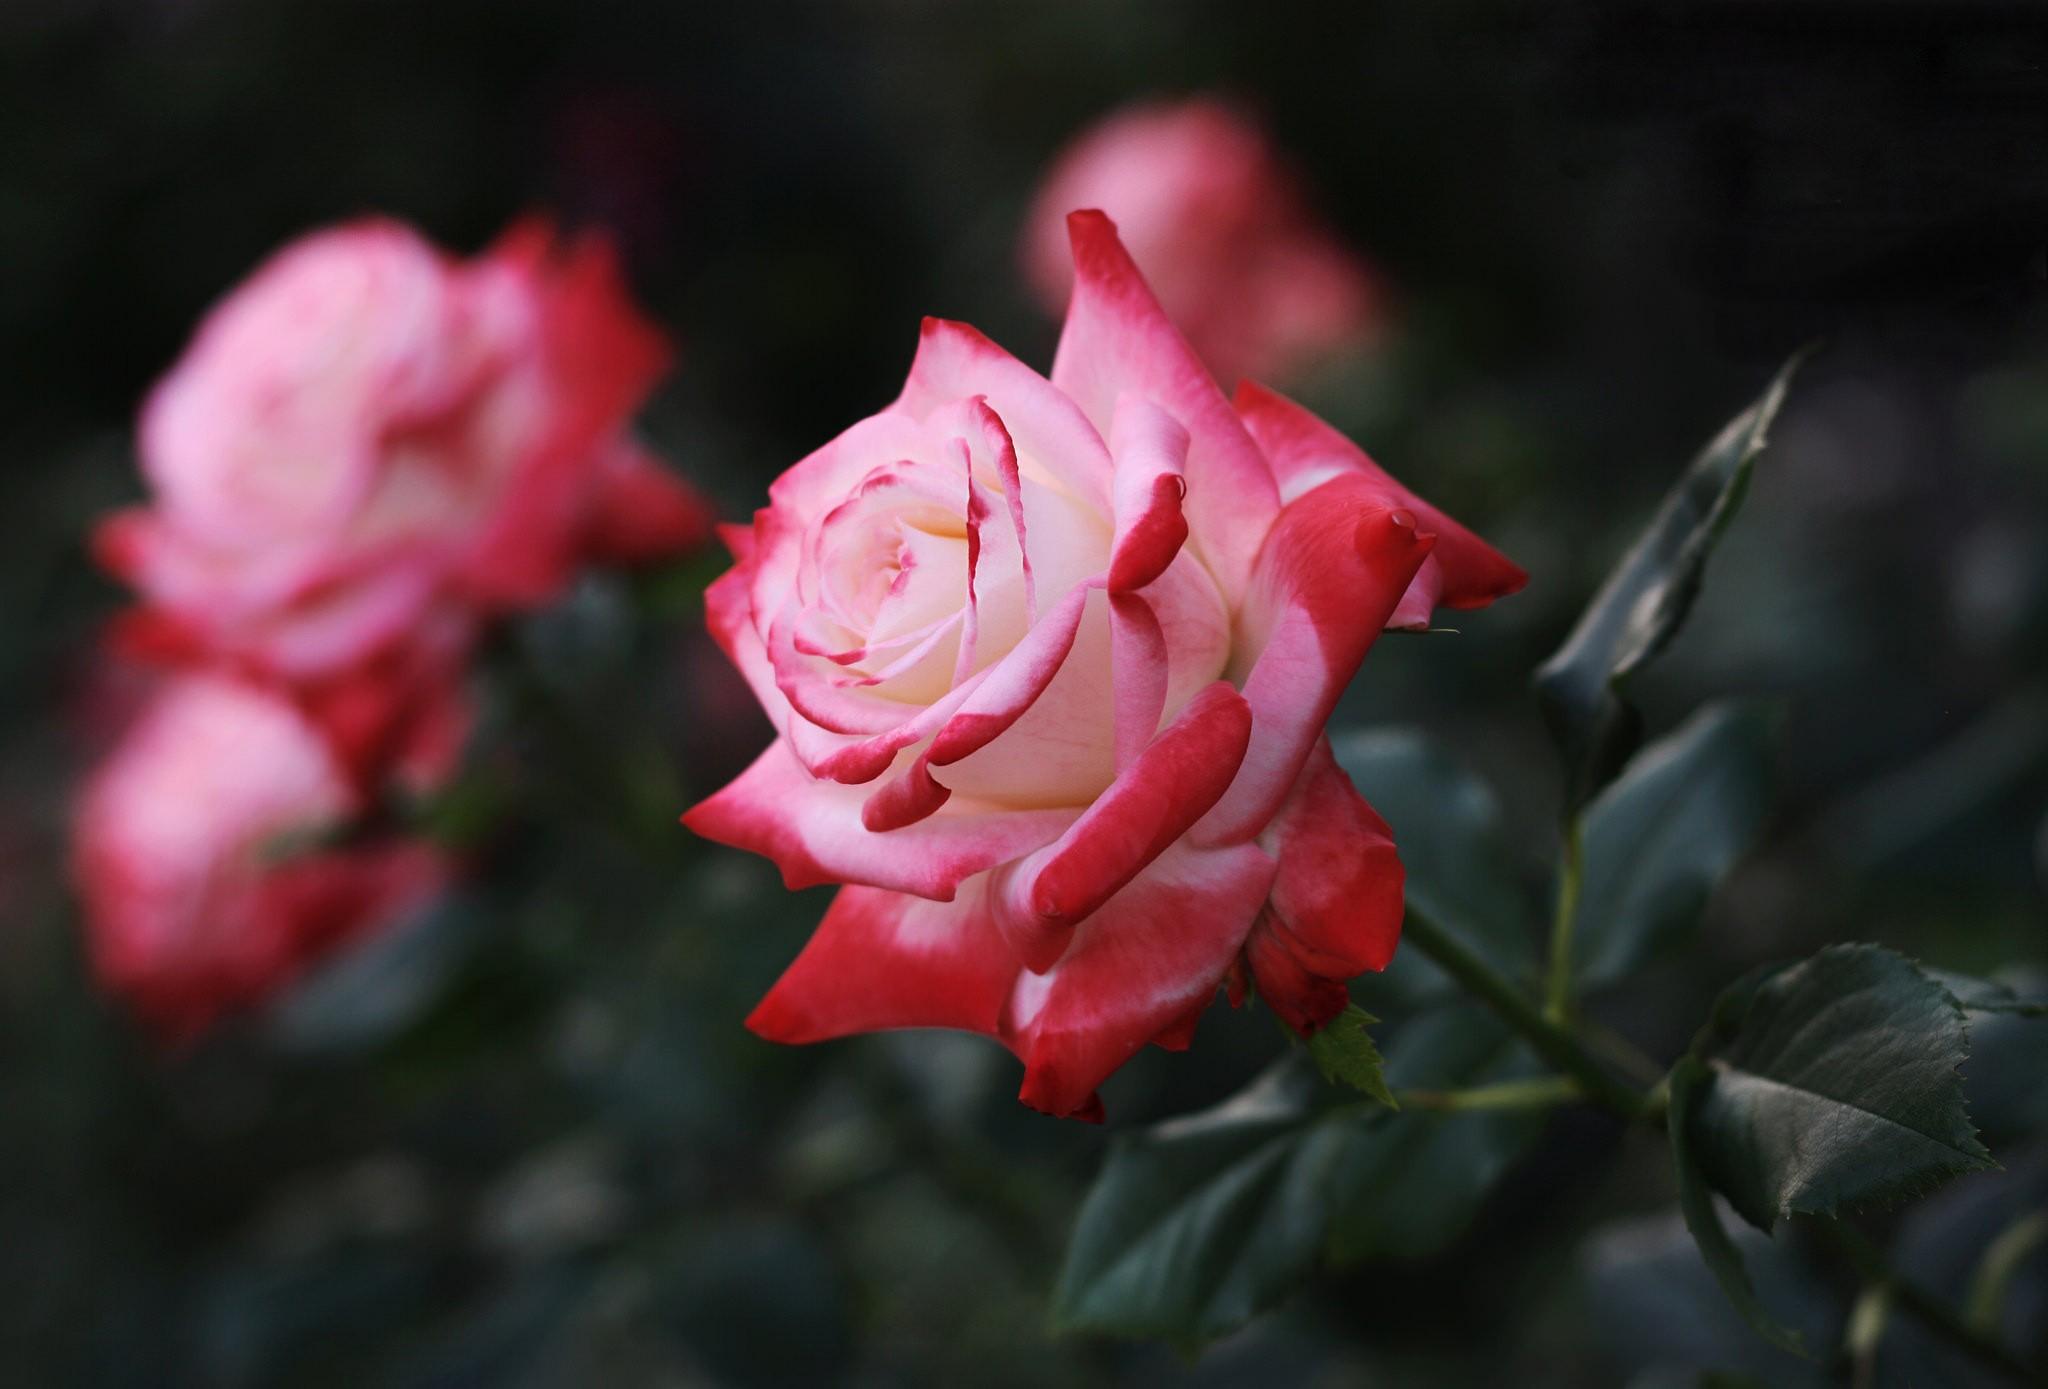 rose-closeup.jpg